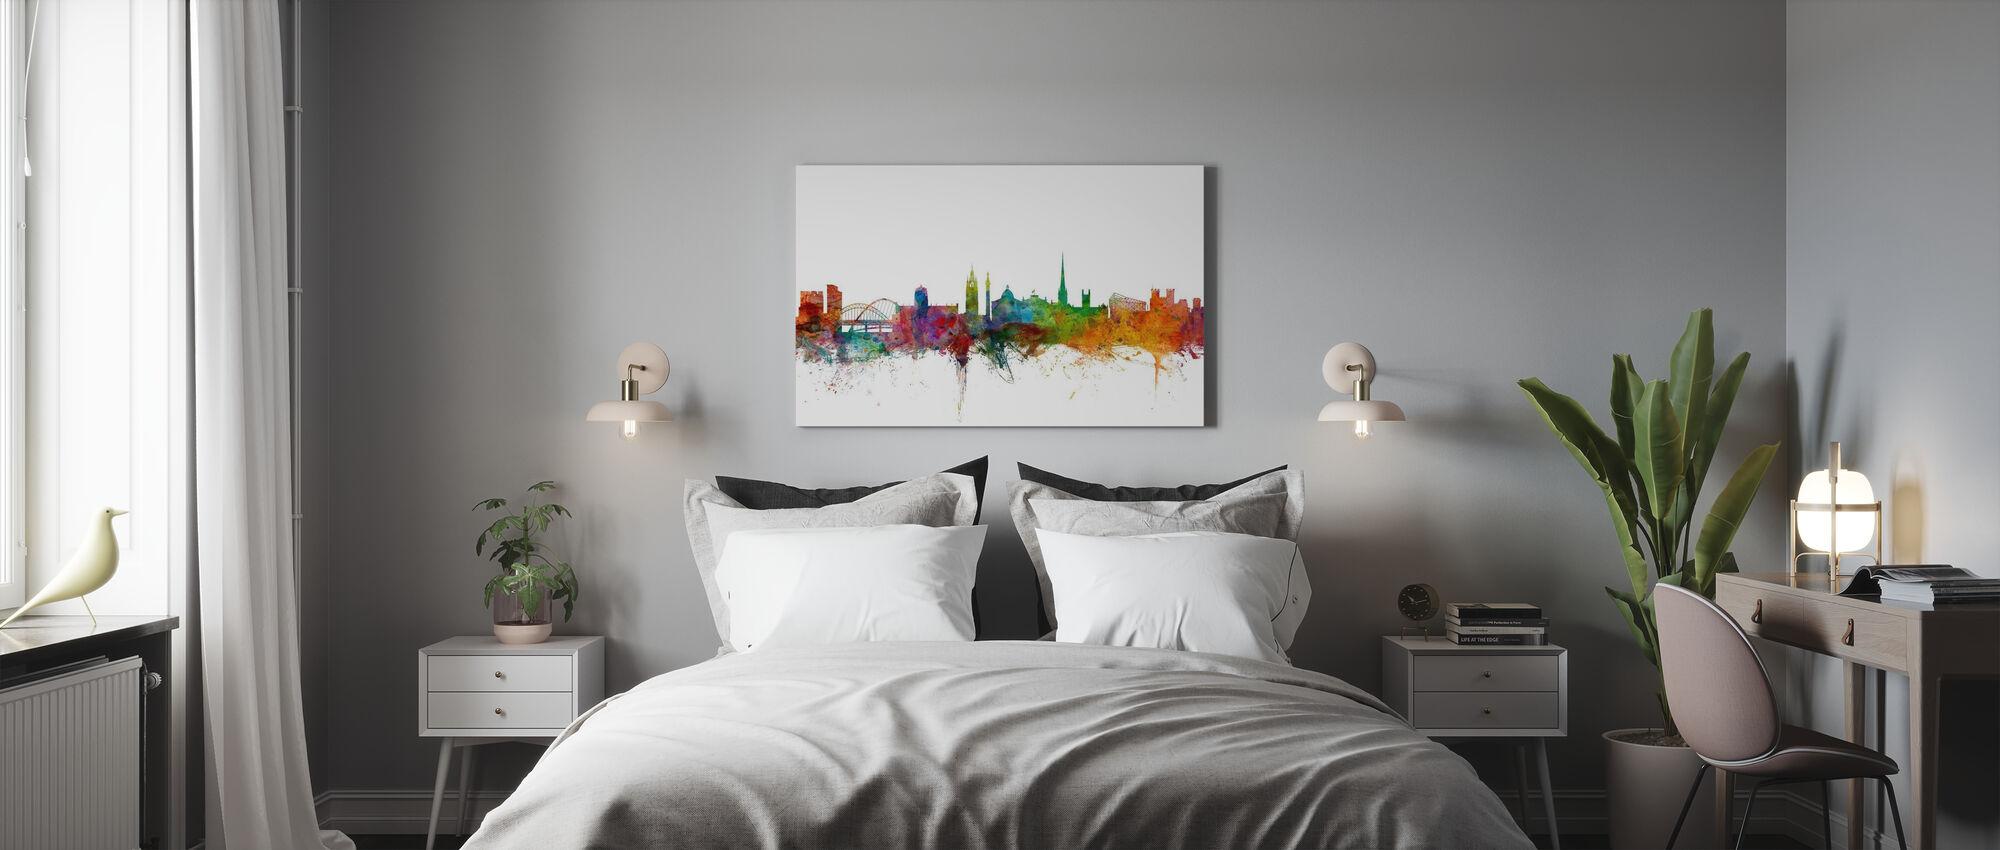 Newcastle England Skyline - Canvas print - Bedroom